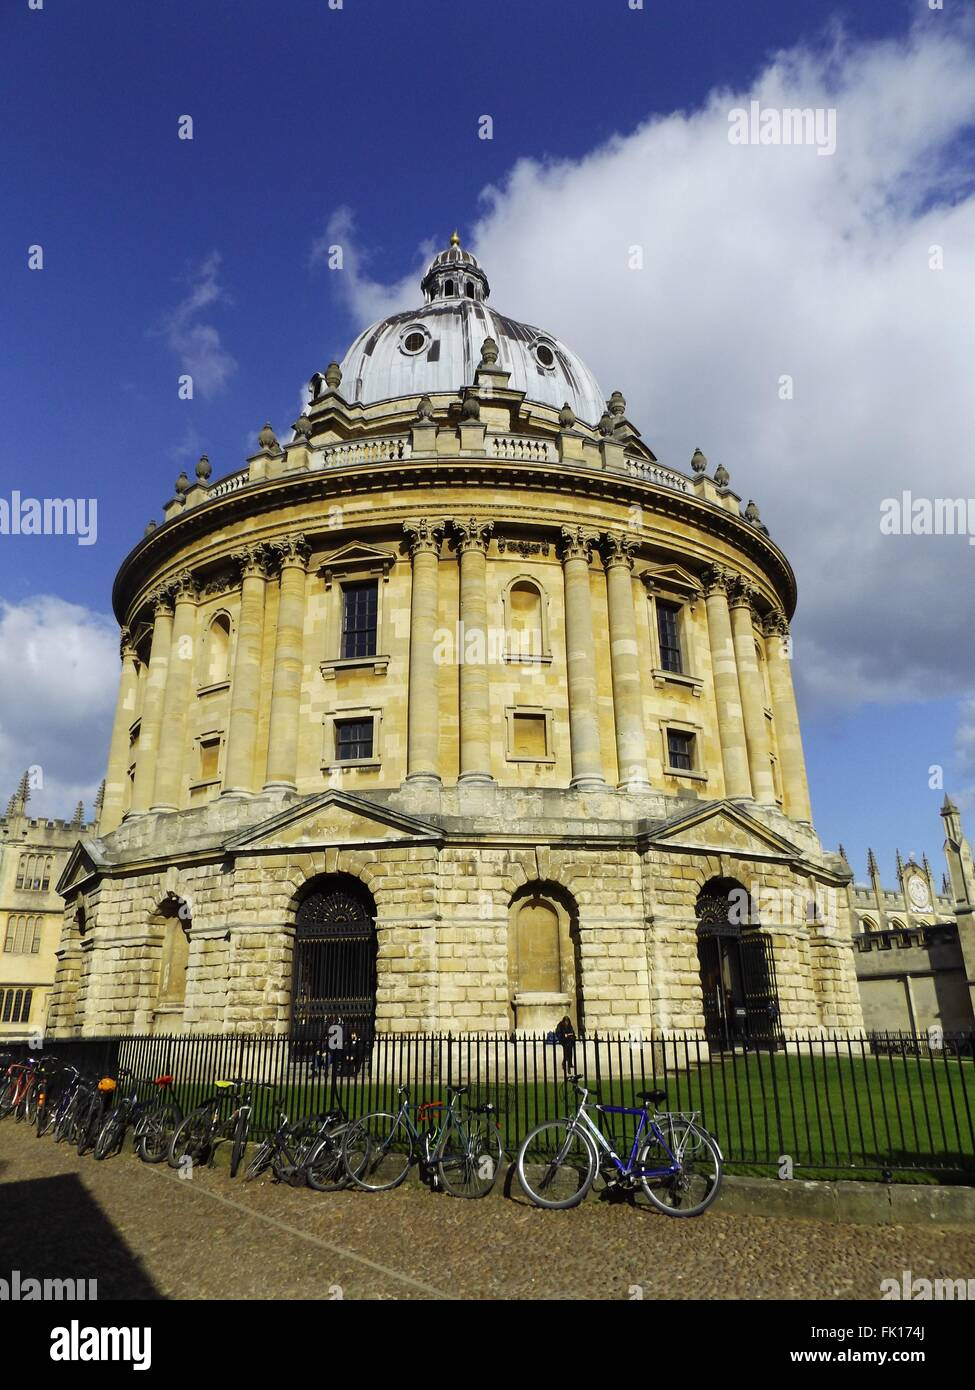 Radcliffe camera, Oxford, UK - Stock Image